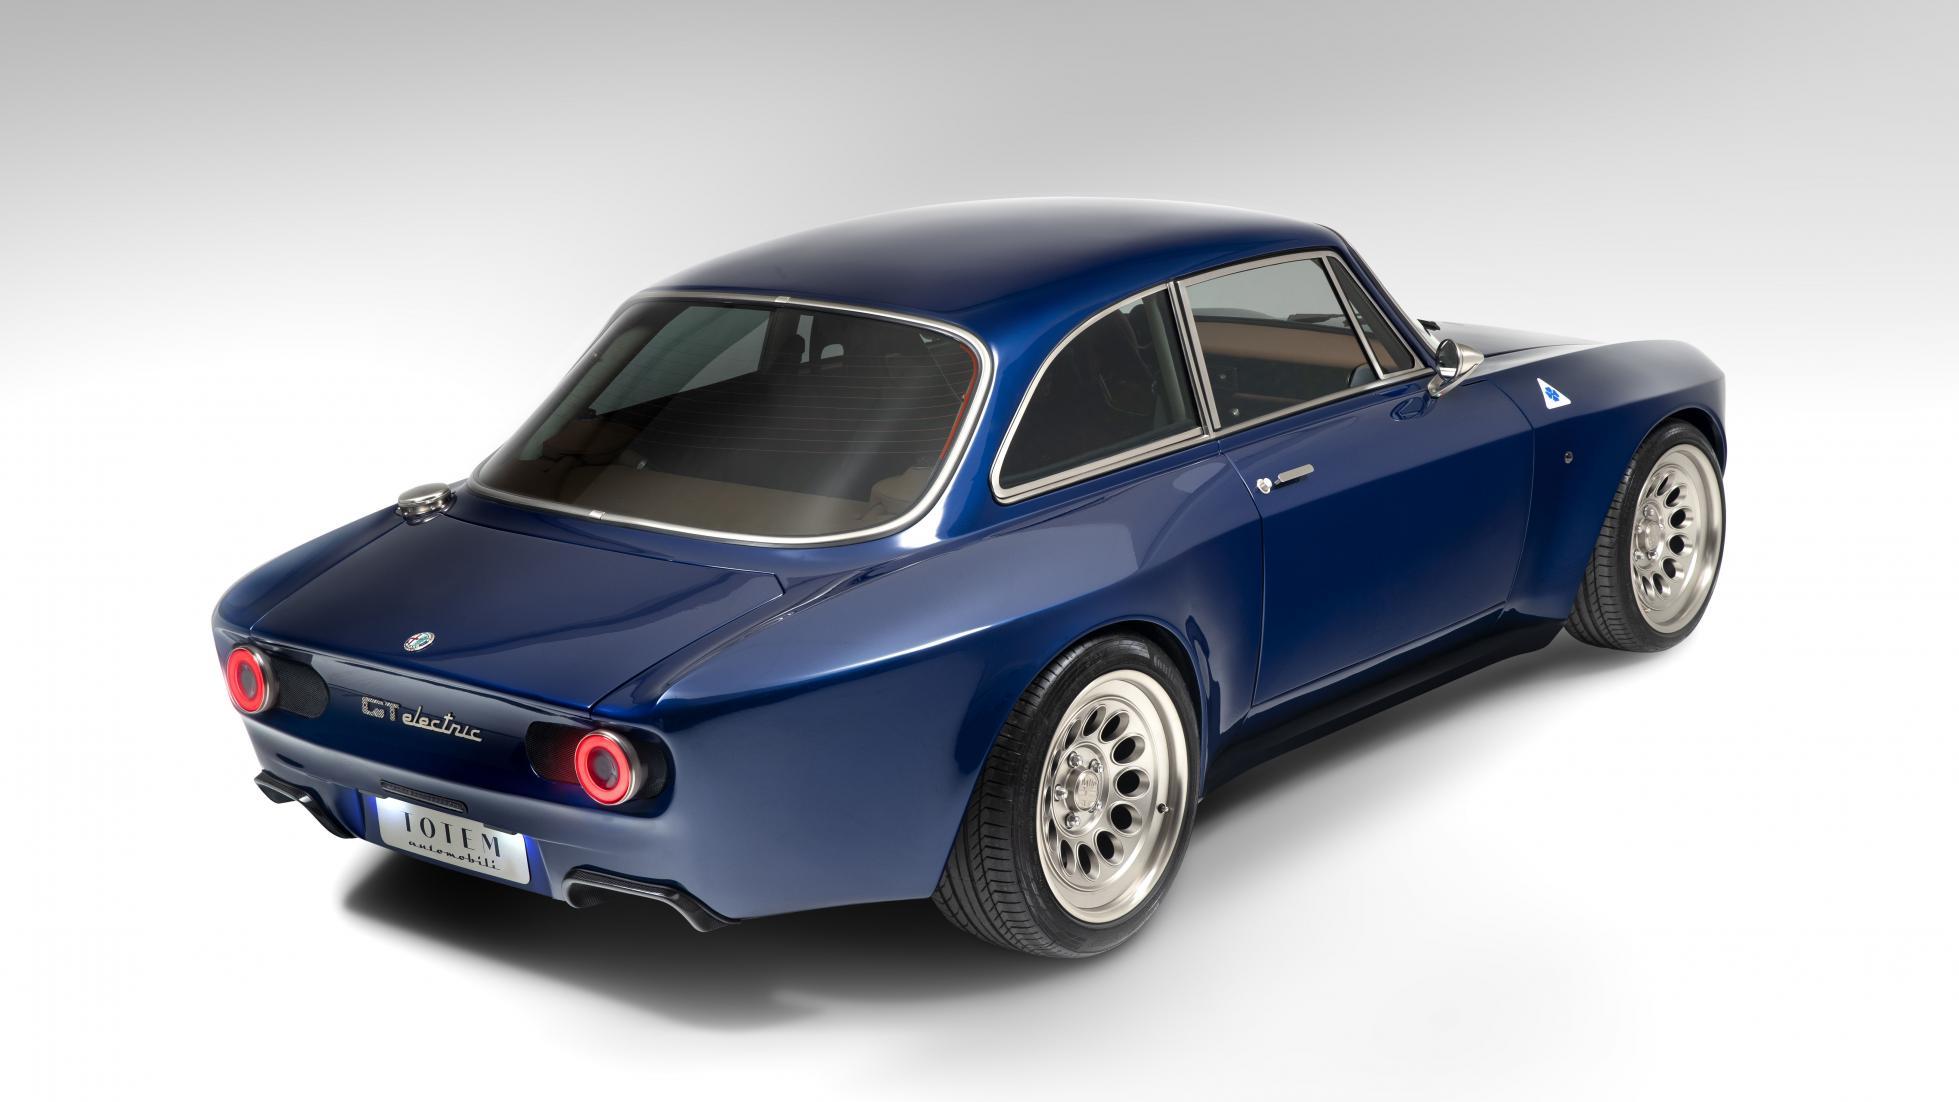 Alfa-Romeo-Giulia-GT-Electric-by-Totem-Automobili-19